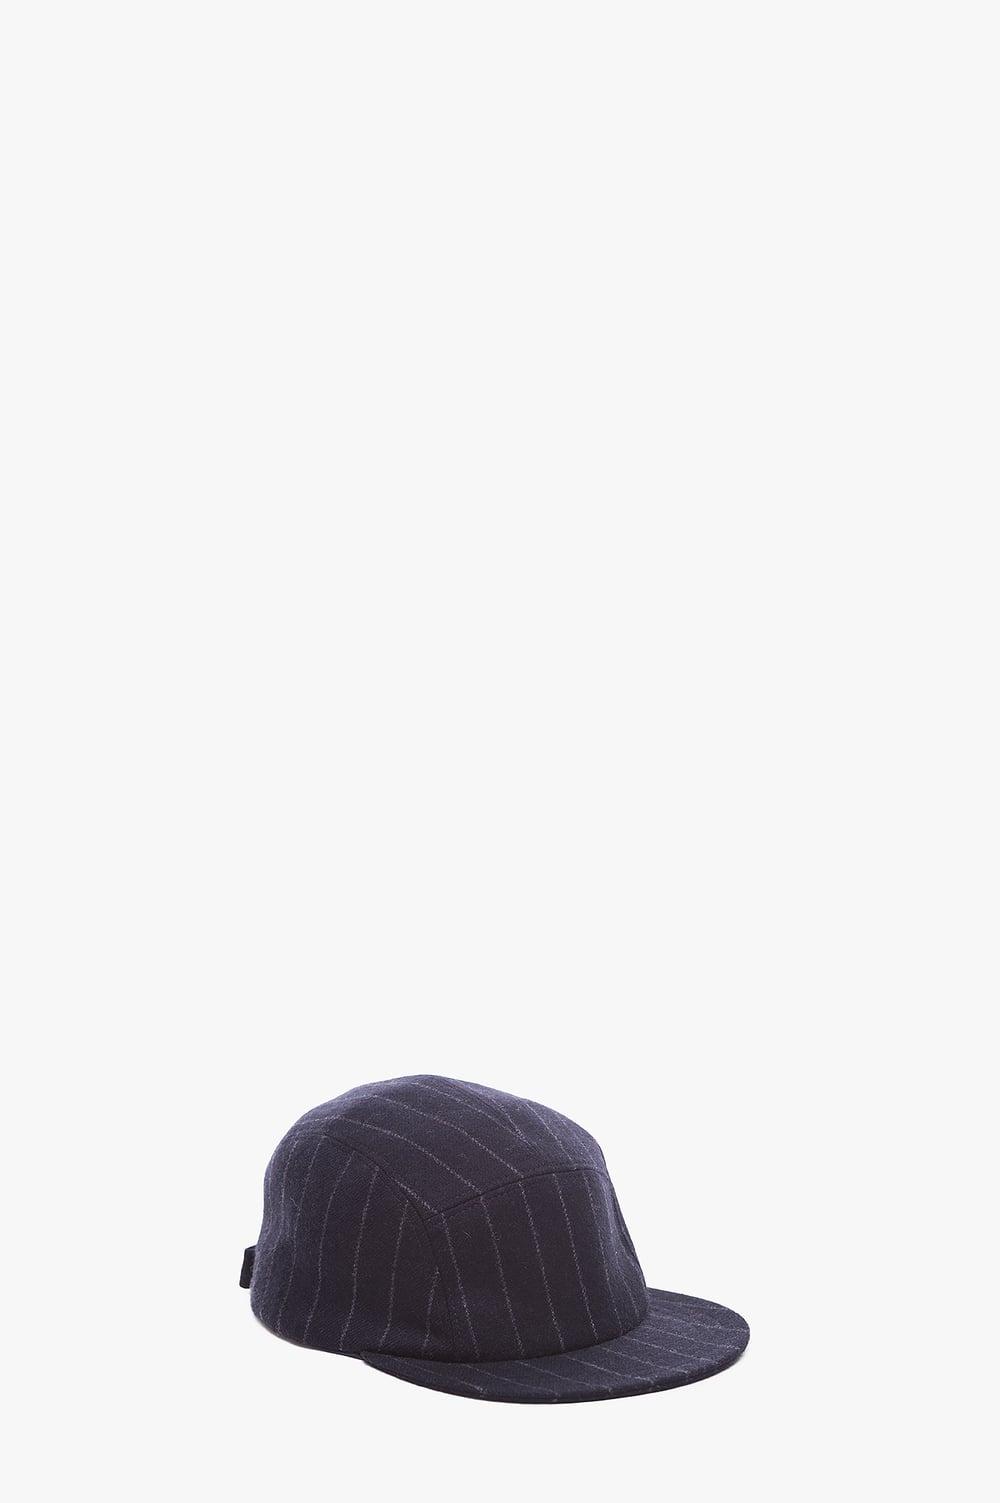 A_0006_SLOU_LISBON_TENNIS_CHAPEUS_20151030__MG_9617_0112.jpg